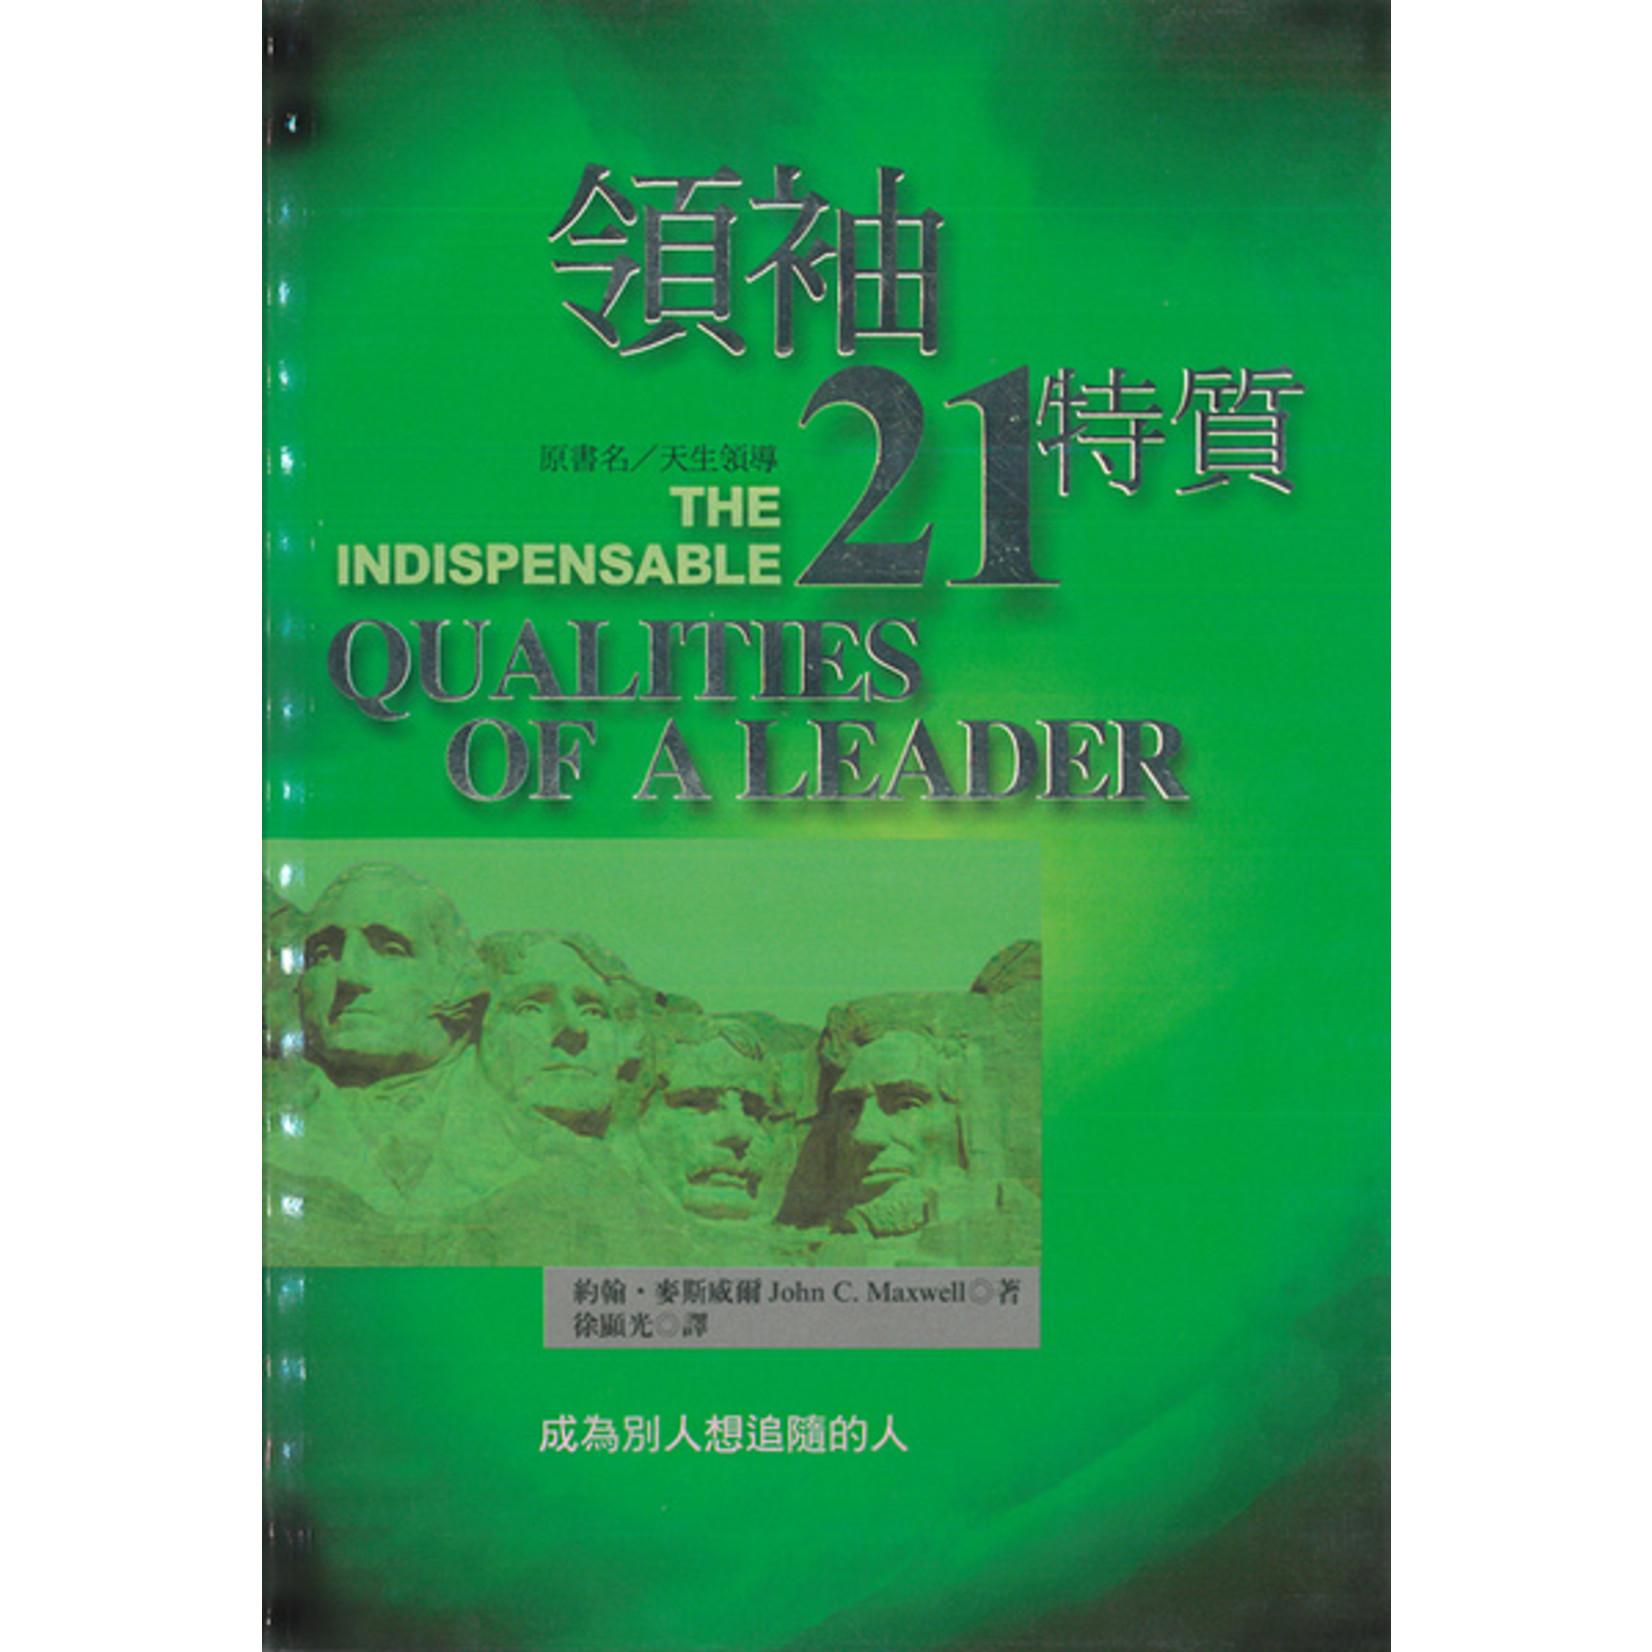 基石 SOW 領袖21特質:成為別人想追隨的人 (原書名:天生領導) The 21 Indispensable Qualities of a Leader